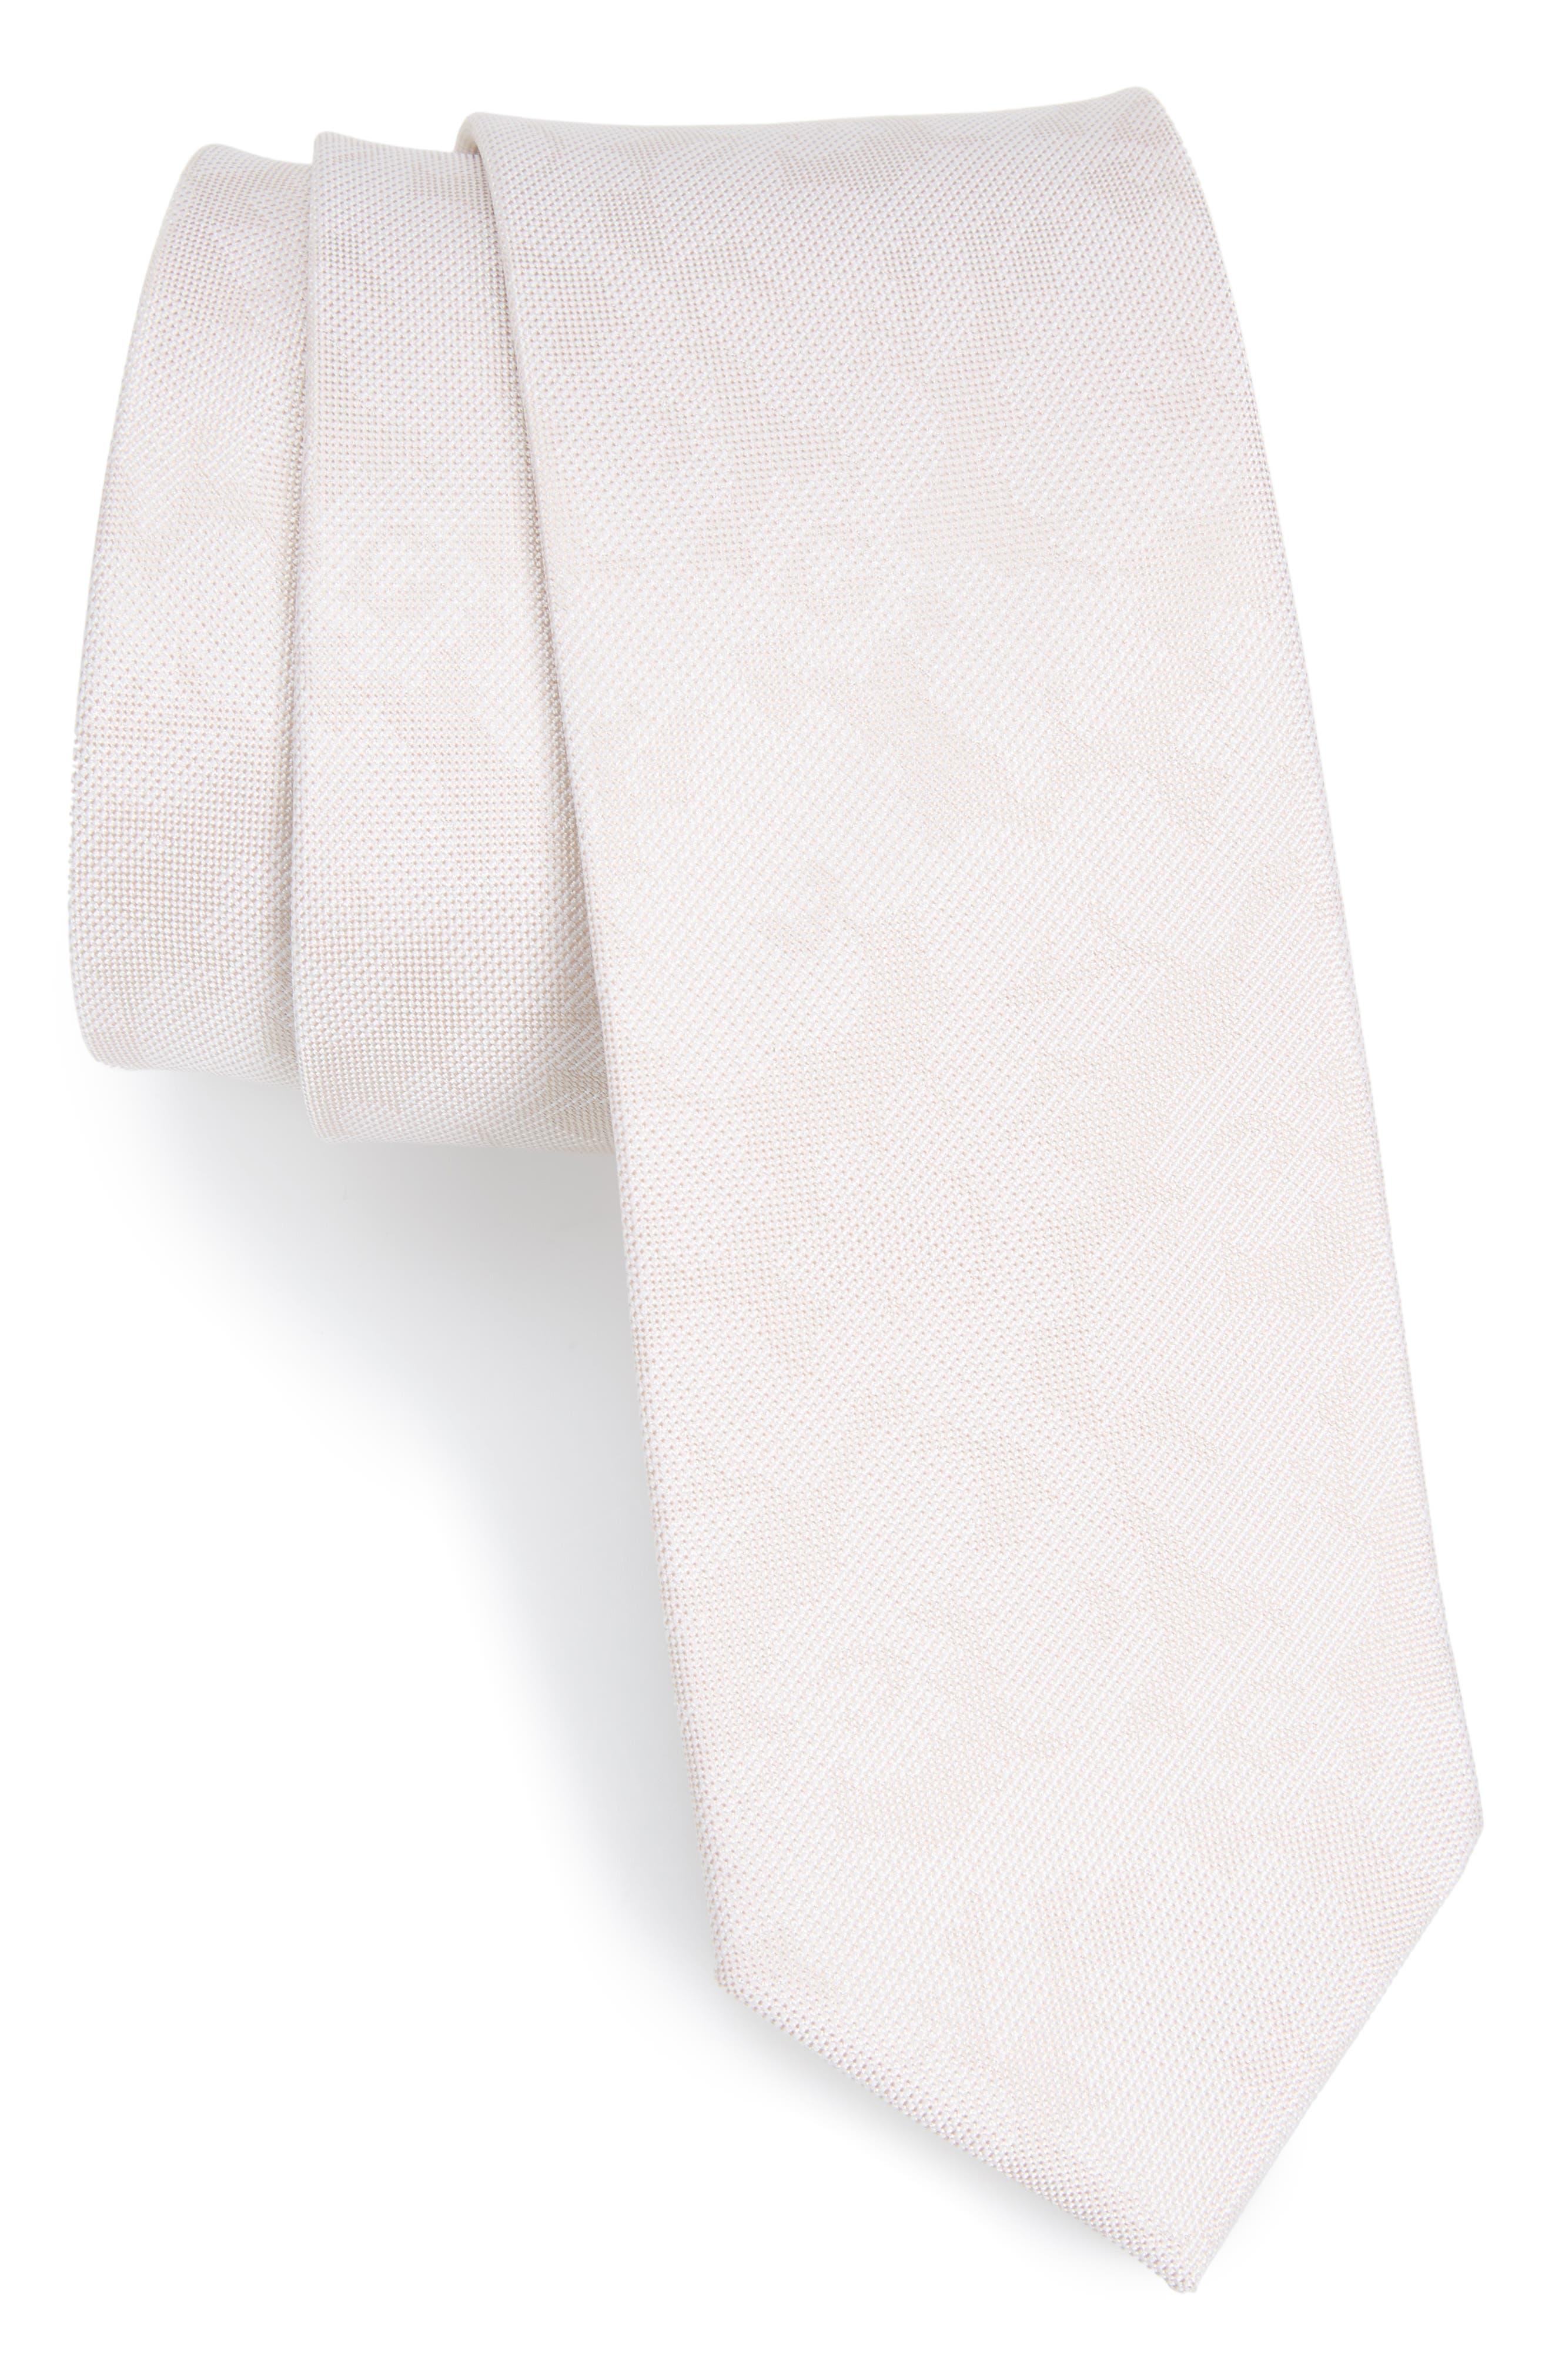 Floral Silk Tie,                             Main thumbnail 1, color,                             270